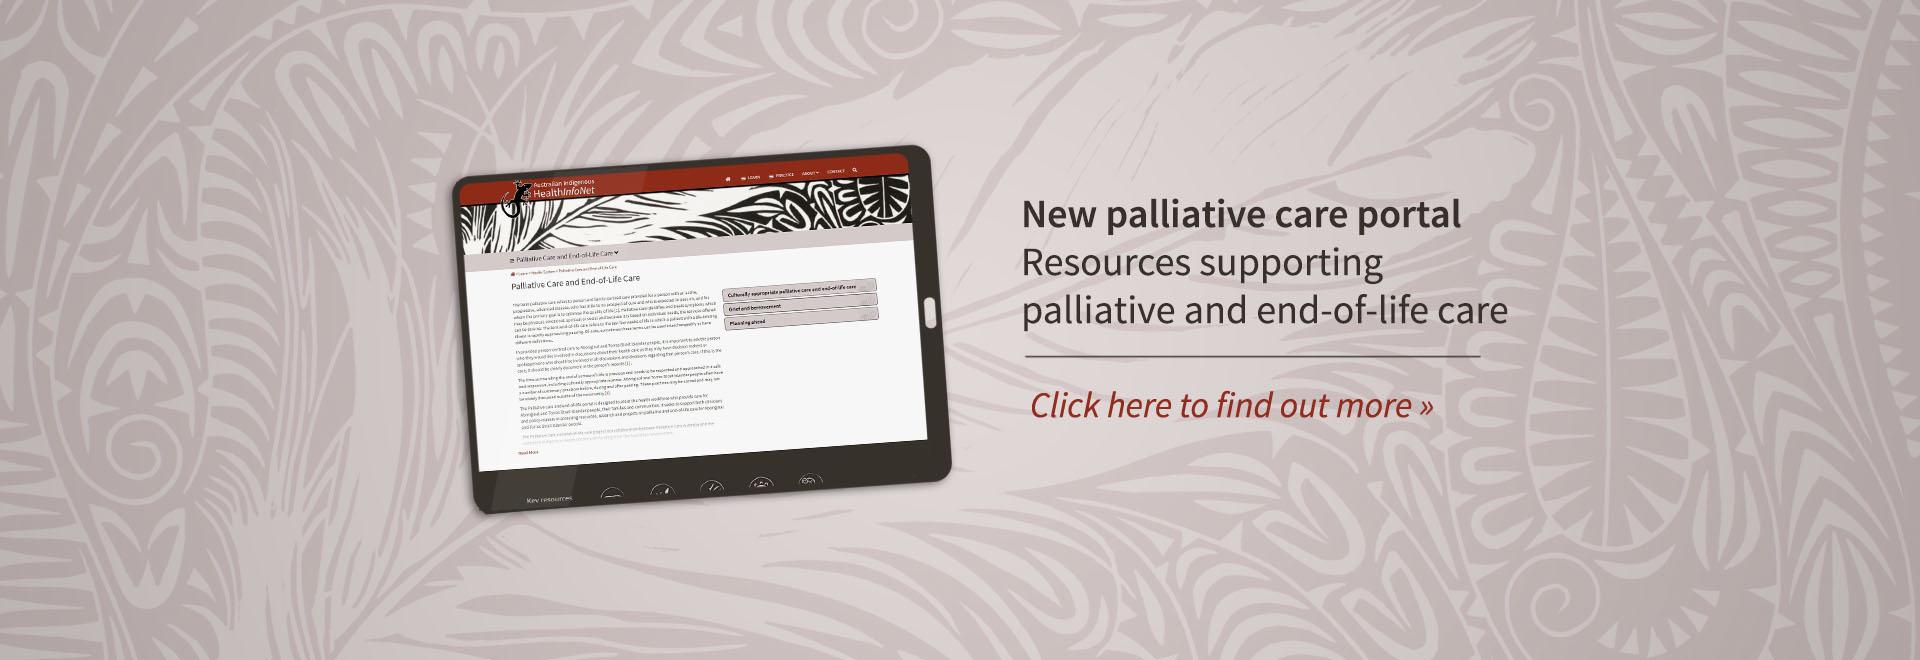 Palliative Care Portal